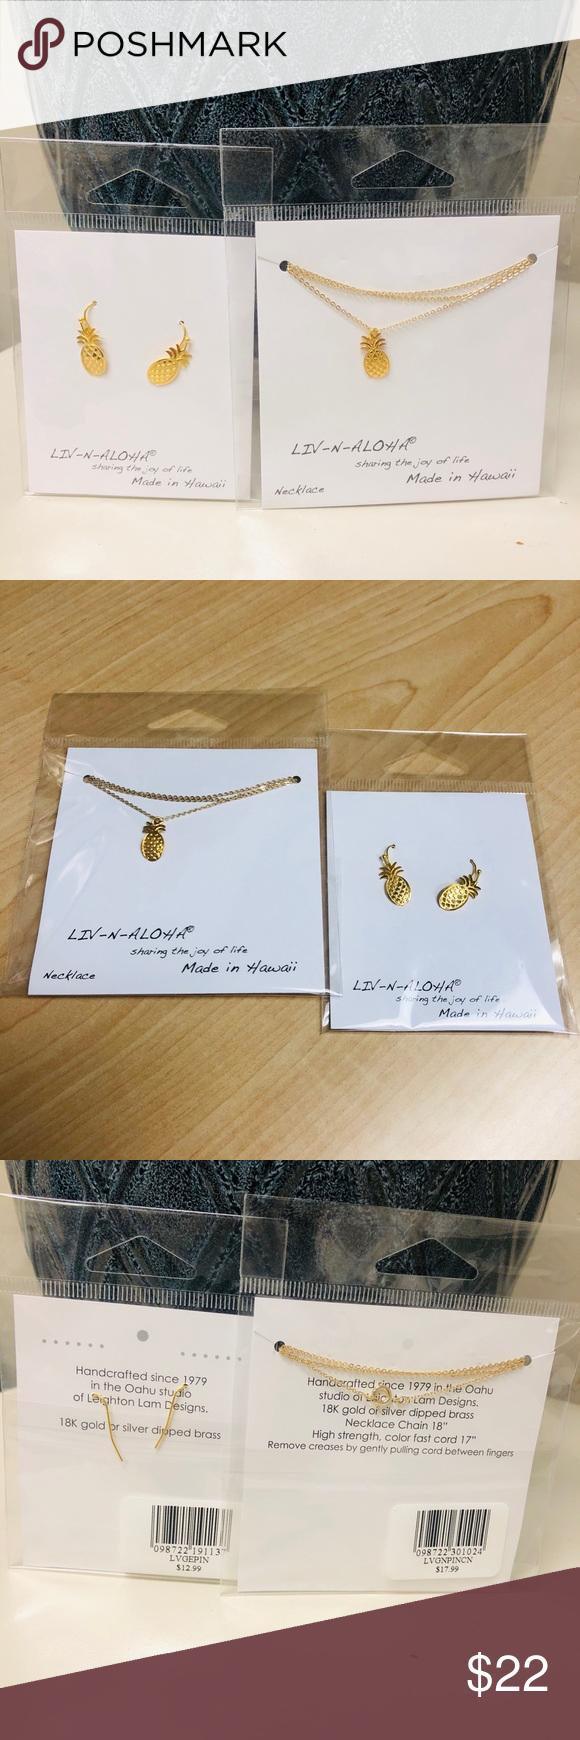 Liv N Aloha Pineapple Jewelry Set New Pineapple Jewelry Beautiful Earrings Jewelry Set